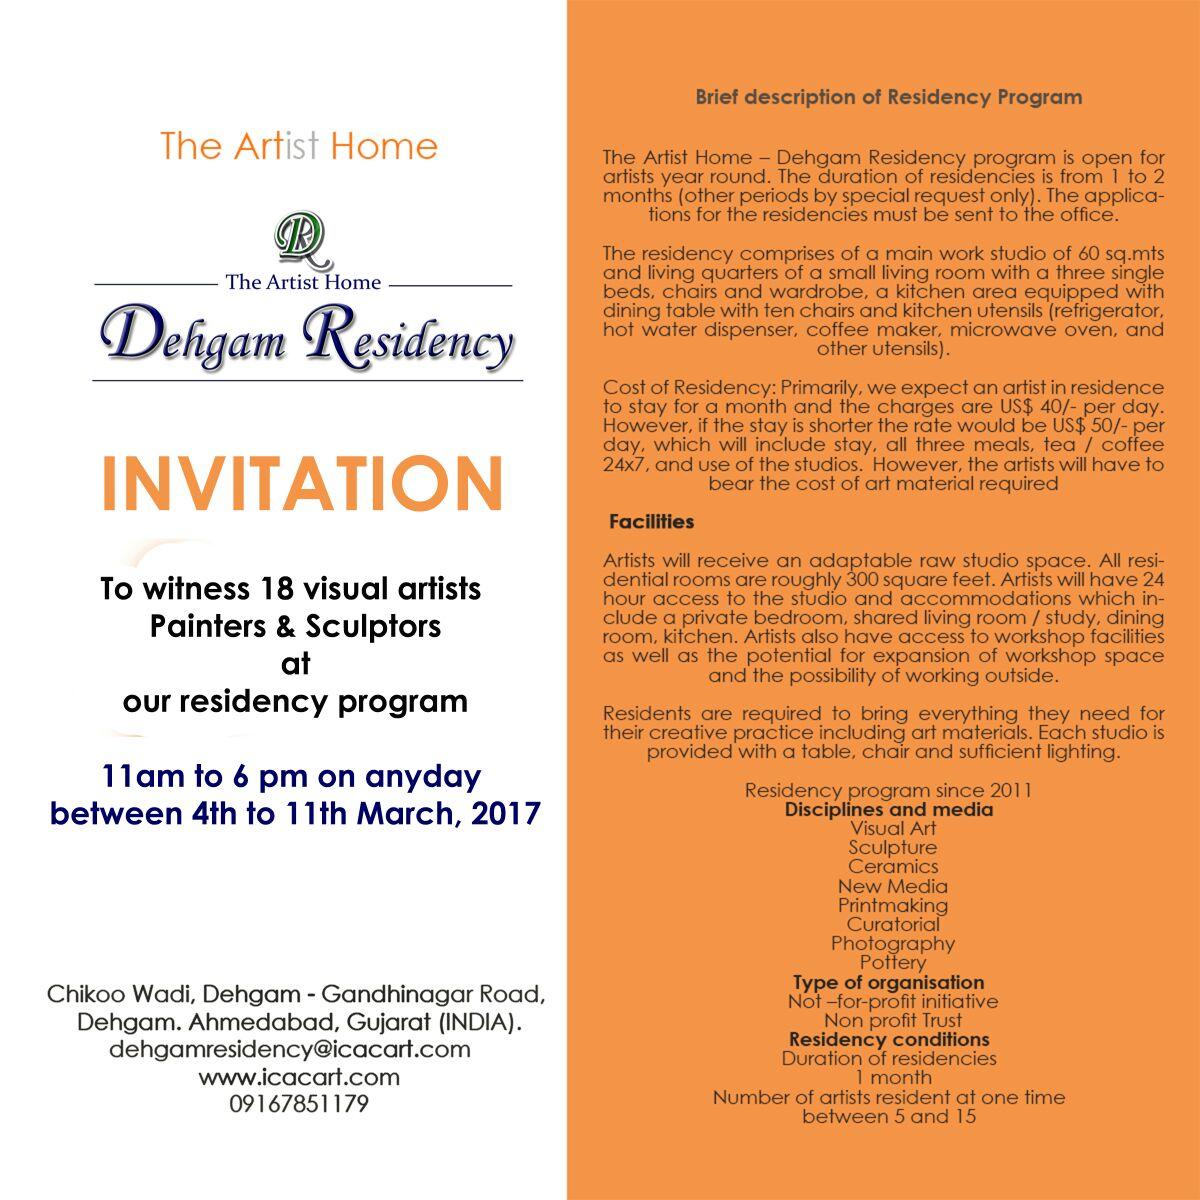 https://creativeyatra.com/wp-content/uploads/2017/02/Dehgam-residency-the-Artists-Home-Ahmedabad.jpeg